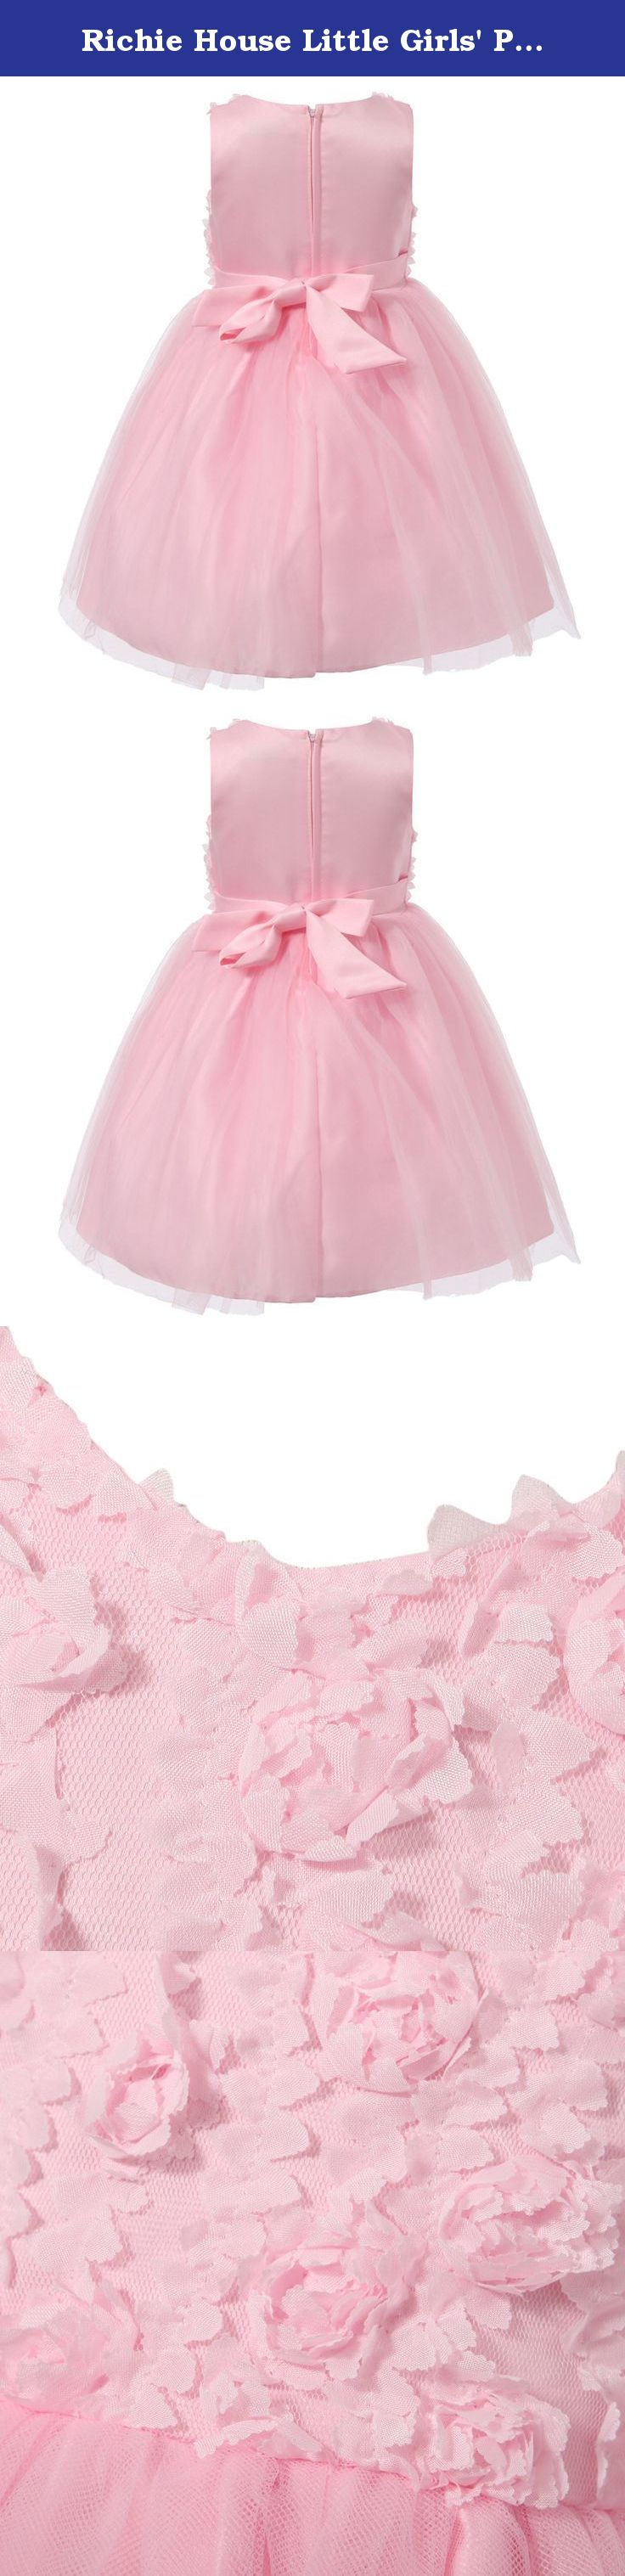 Richie house little girlsu princess dress with flowers rha